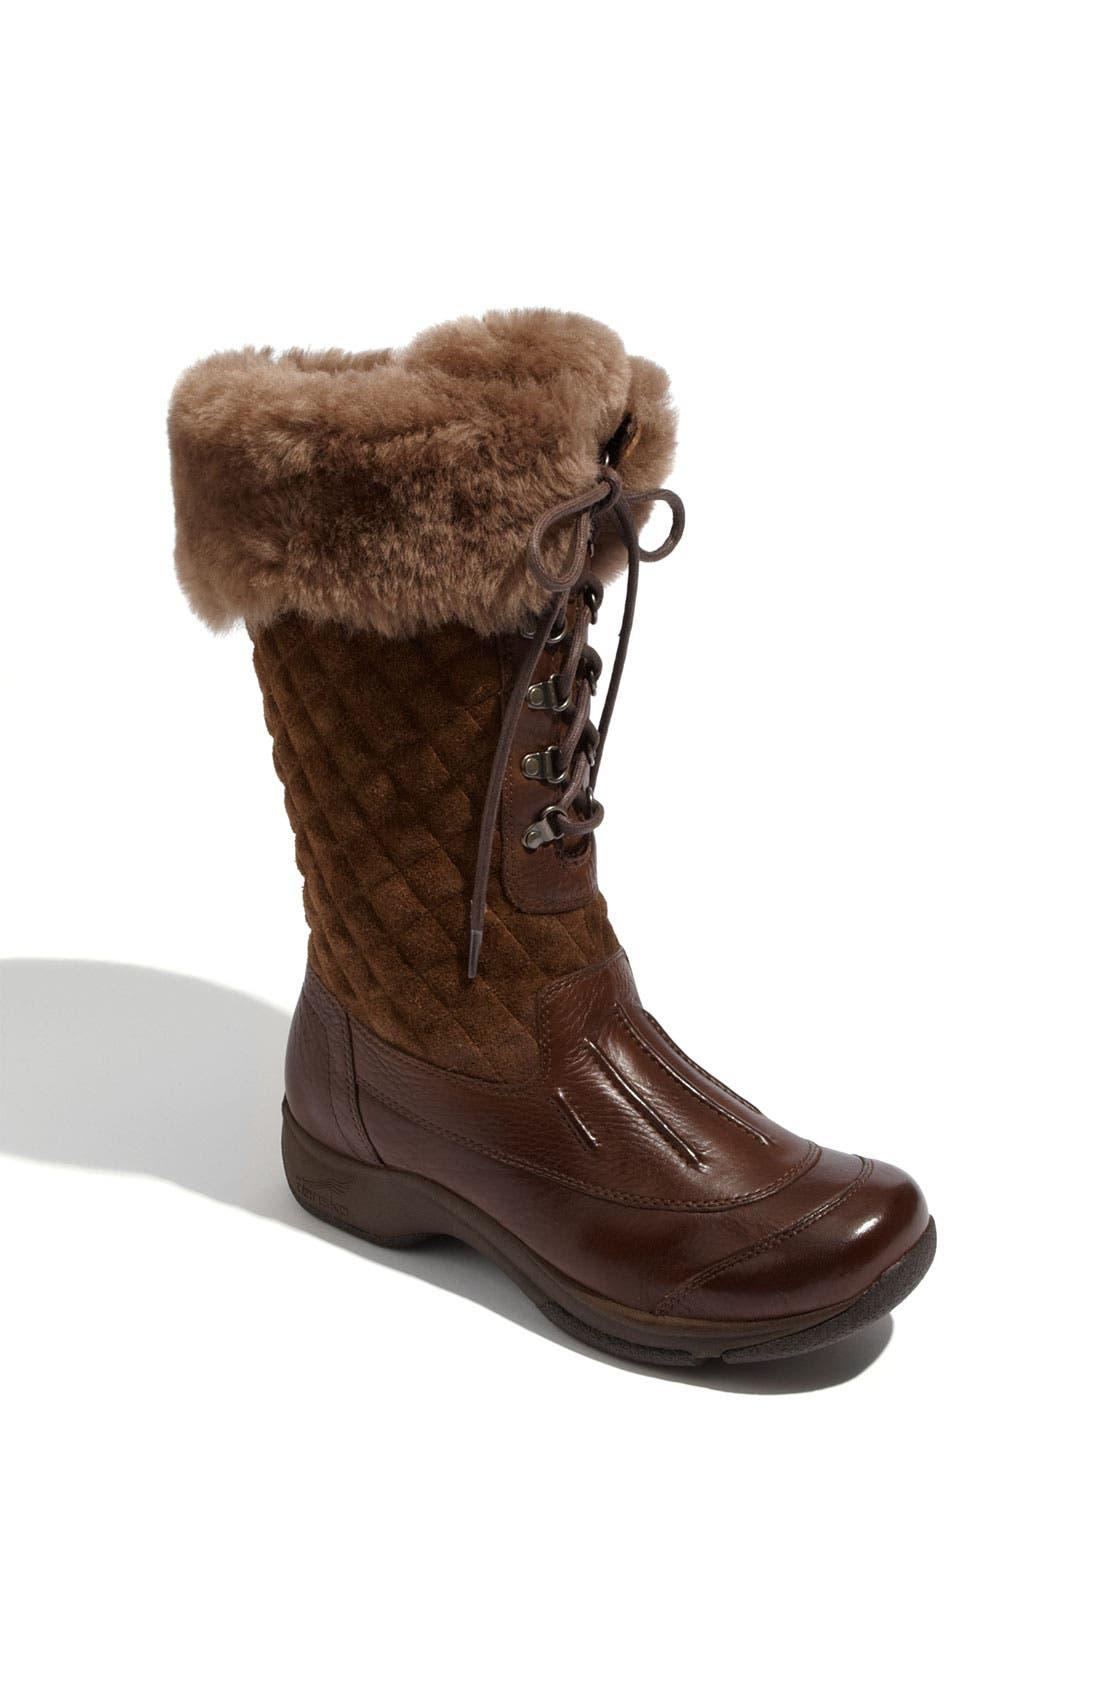 Main Image - Dansko 'Kassidy' Boot